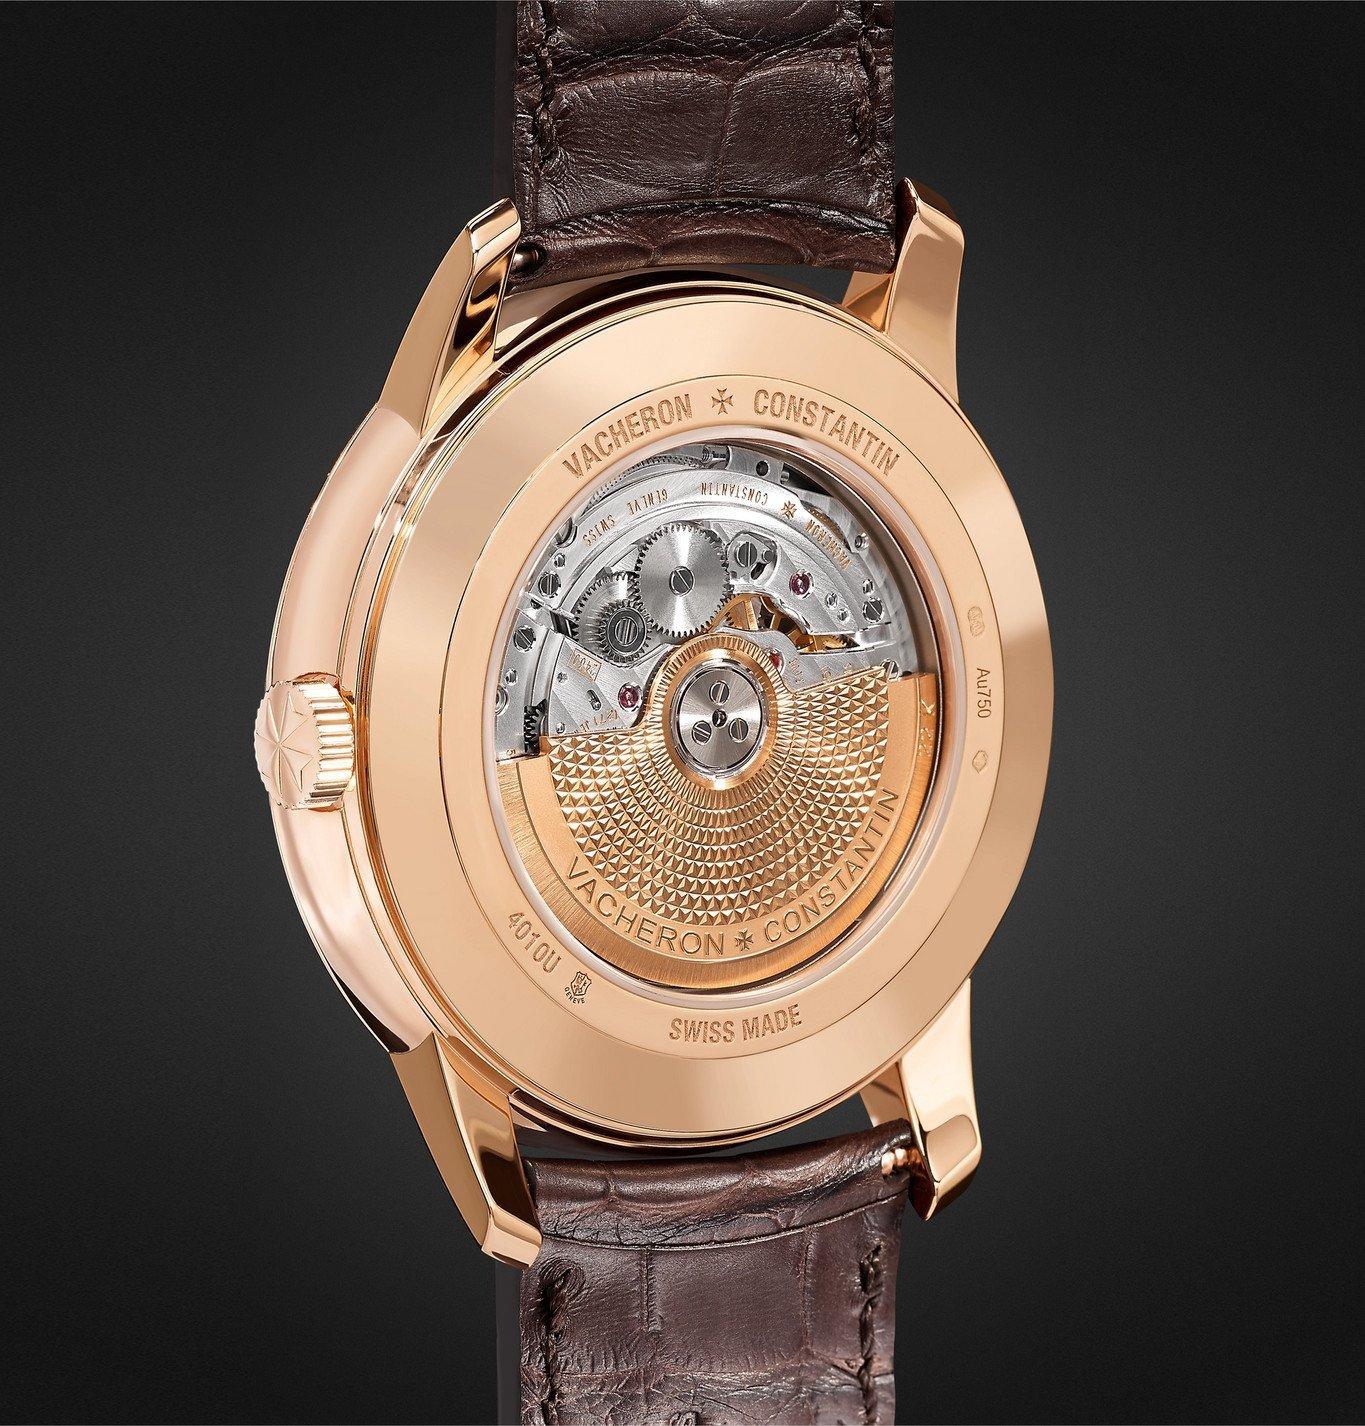 Vacheron Constantin - Patrimony Moon Phase and Retrograde Date Automatic 42.5mm 18 Karat Pink Gold and Alligator Watch, Ref. No. 4010U/000R-B329 - Unknown